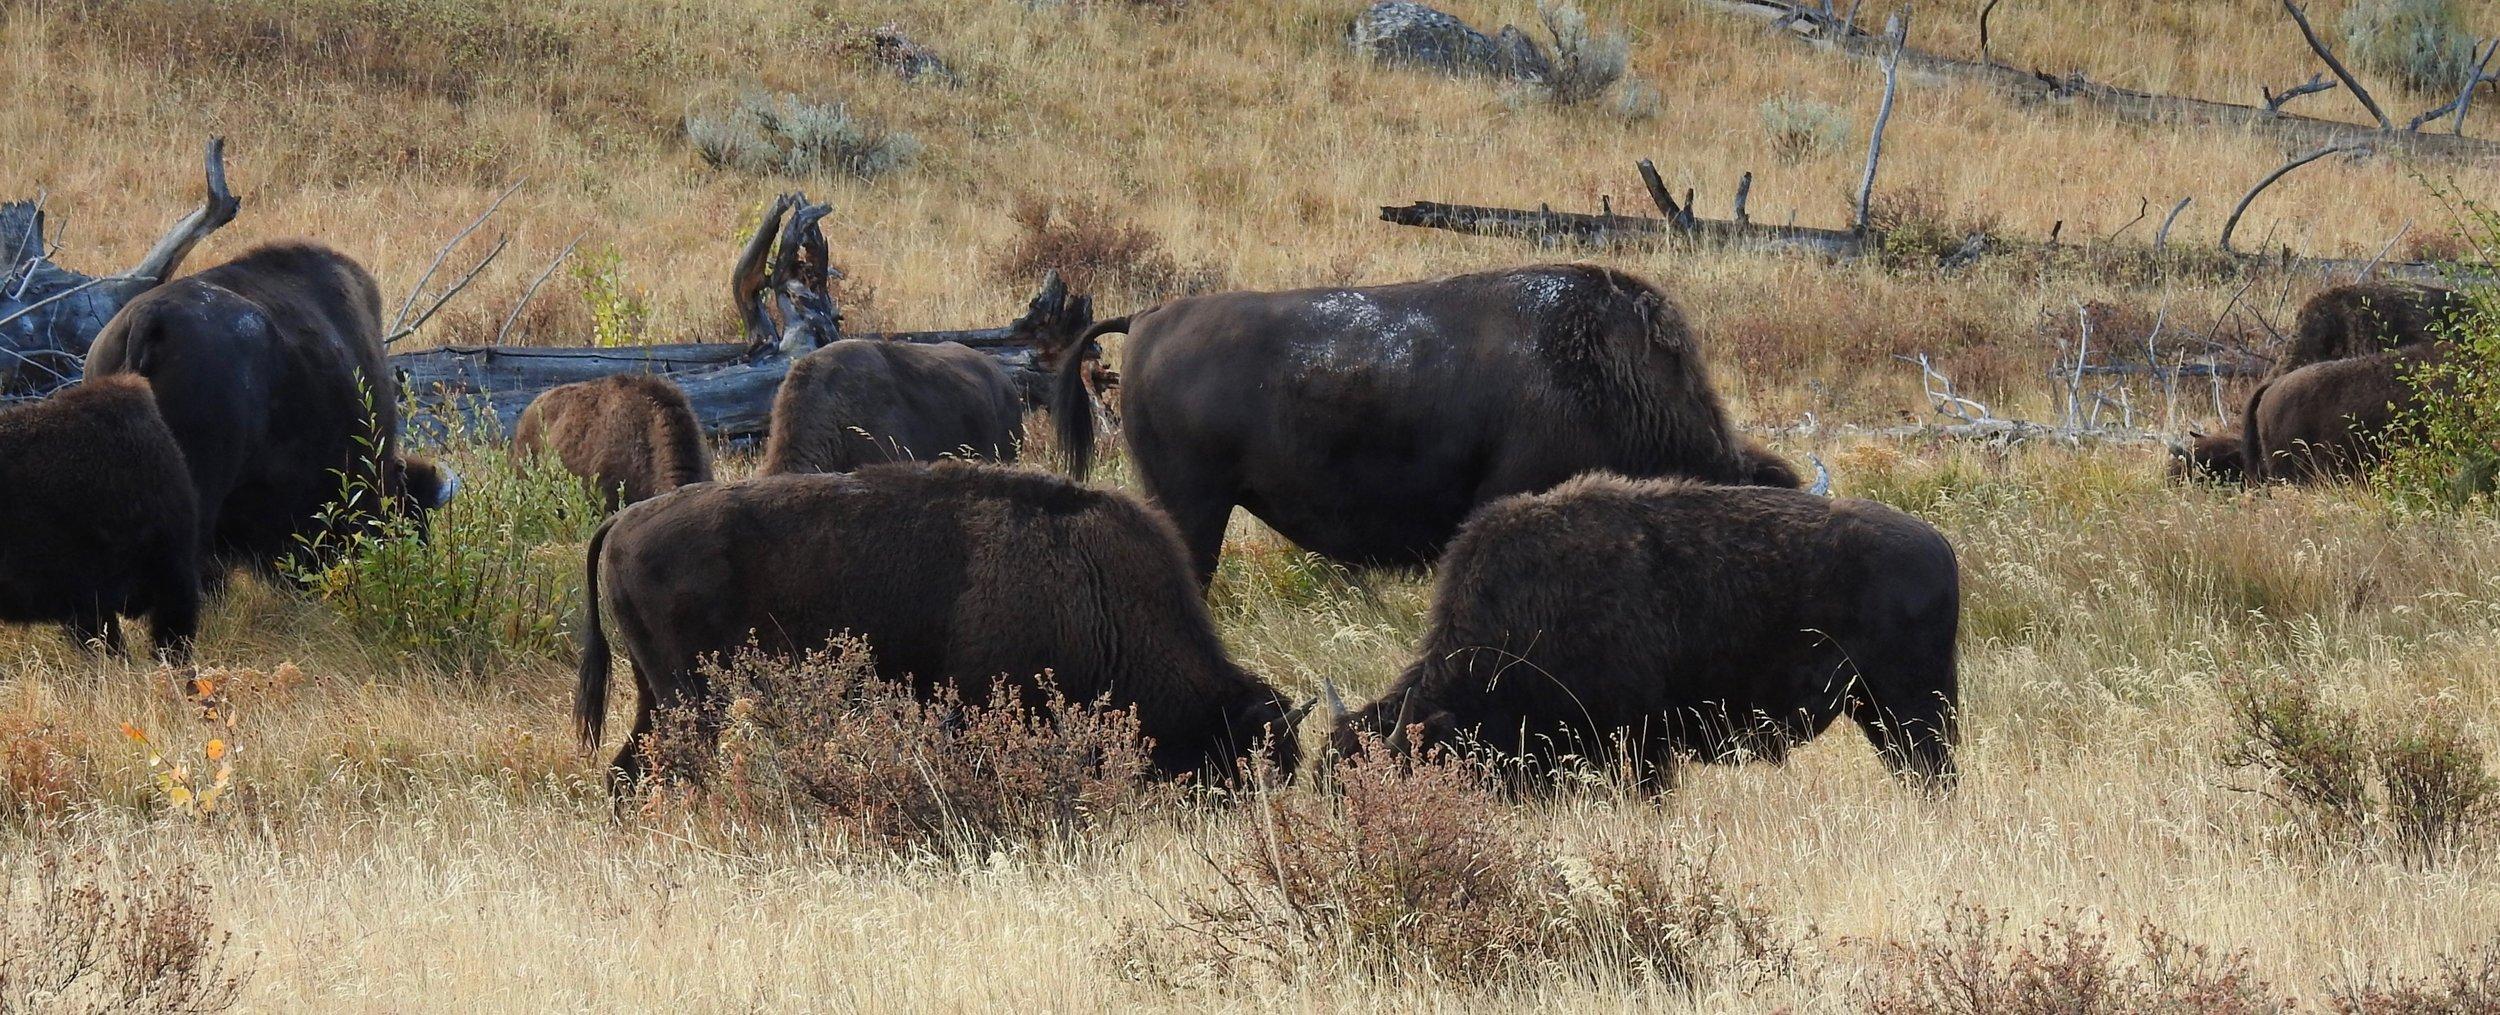 Buffalo feast.jpg